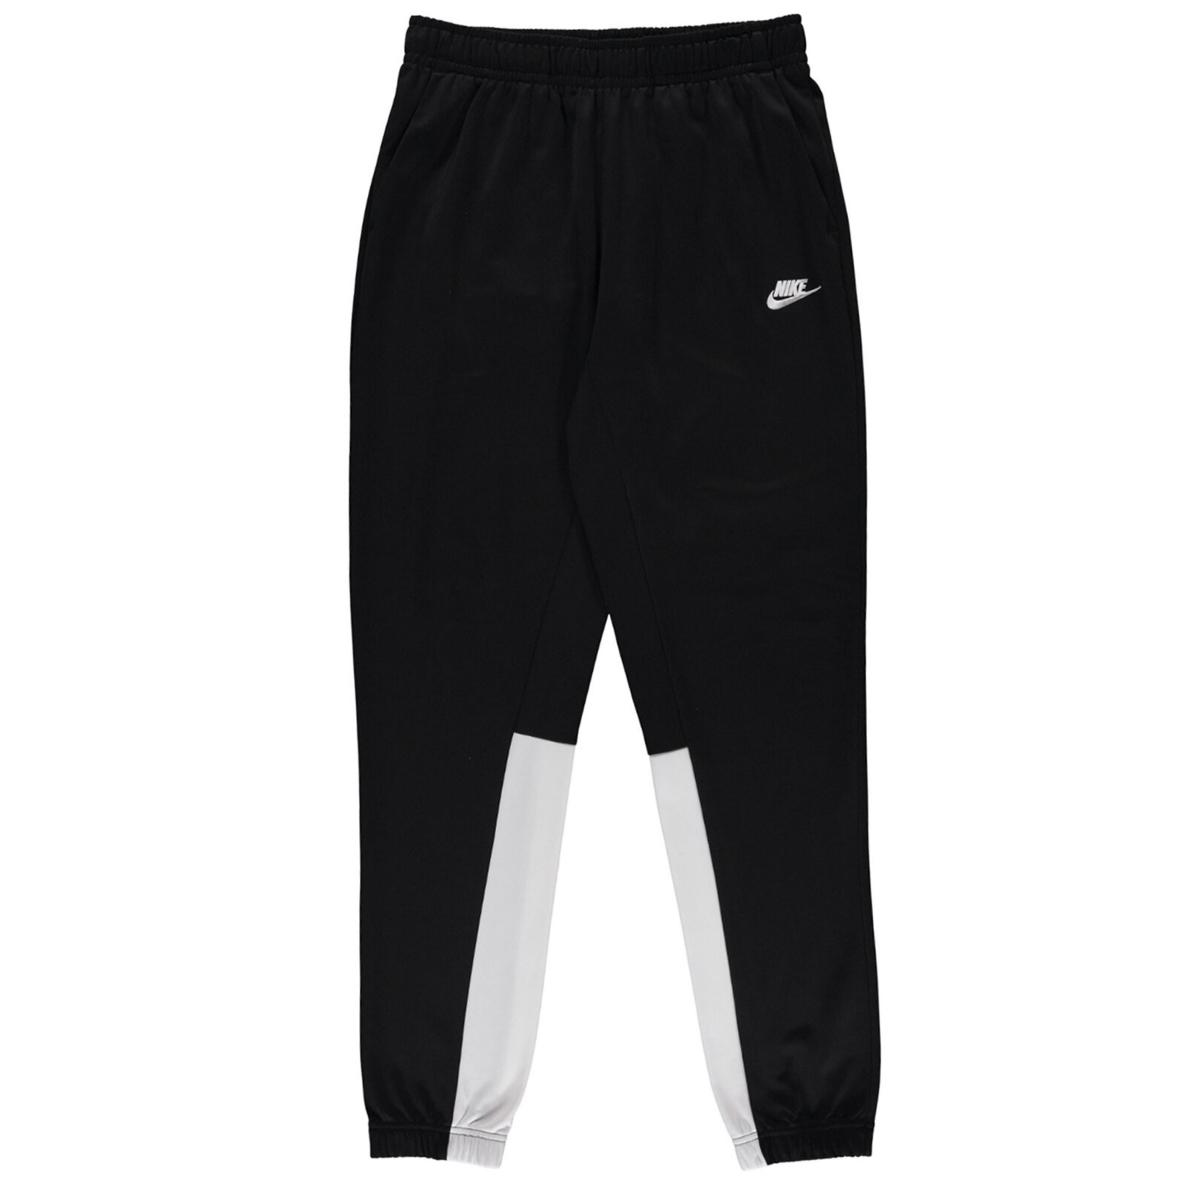 Tuta Nike Sportswear felpa con zip da uomo rif. BV3055-010